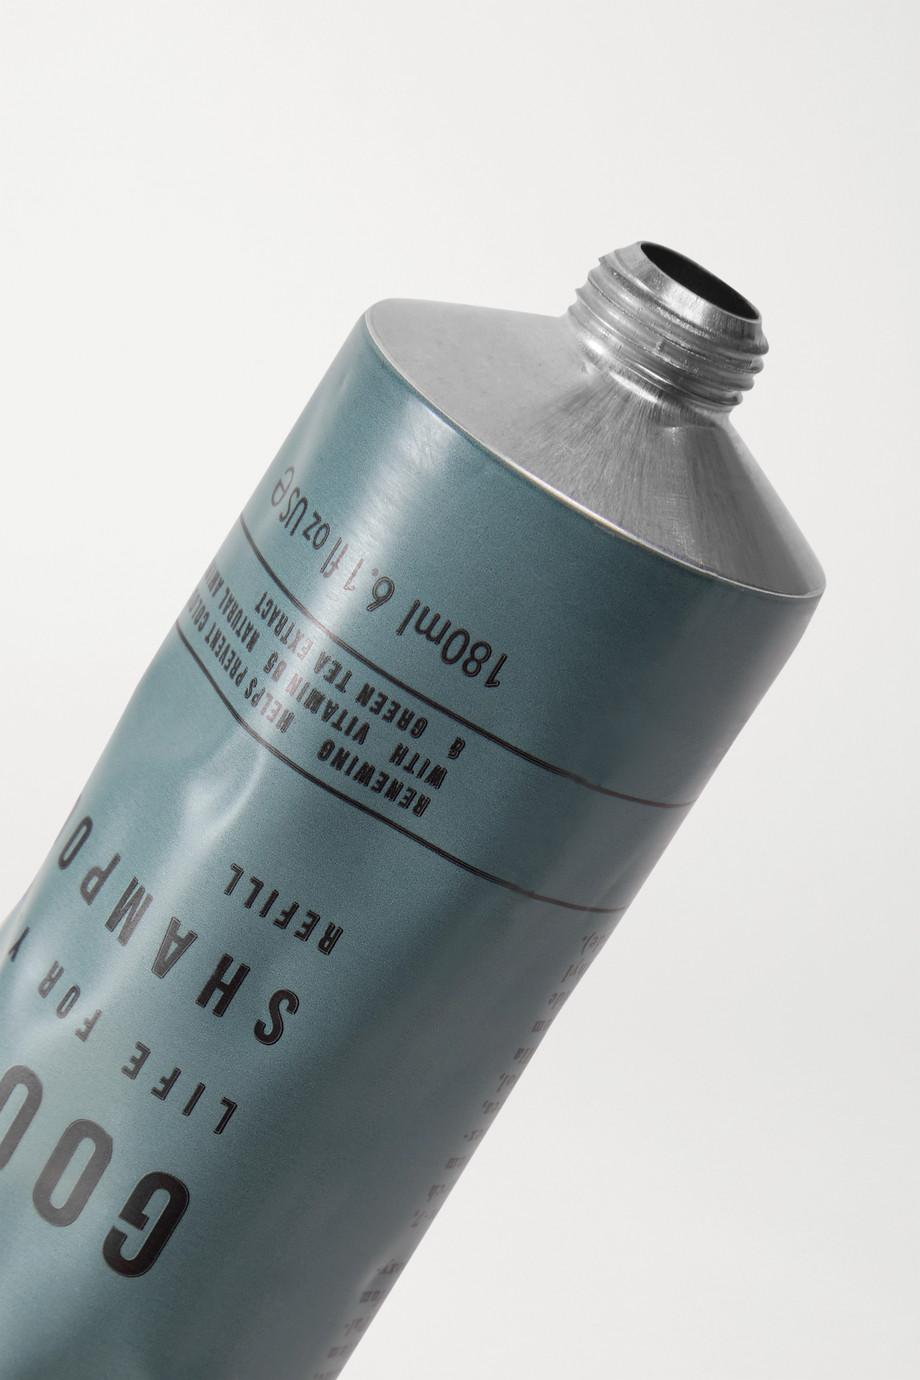 Larry King Good Life Shampoo Refill, 180ml